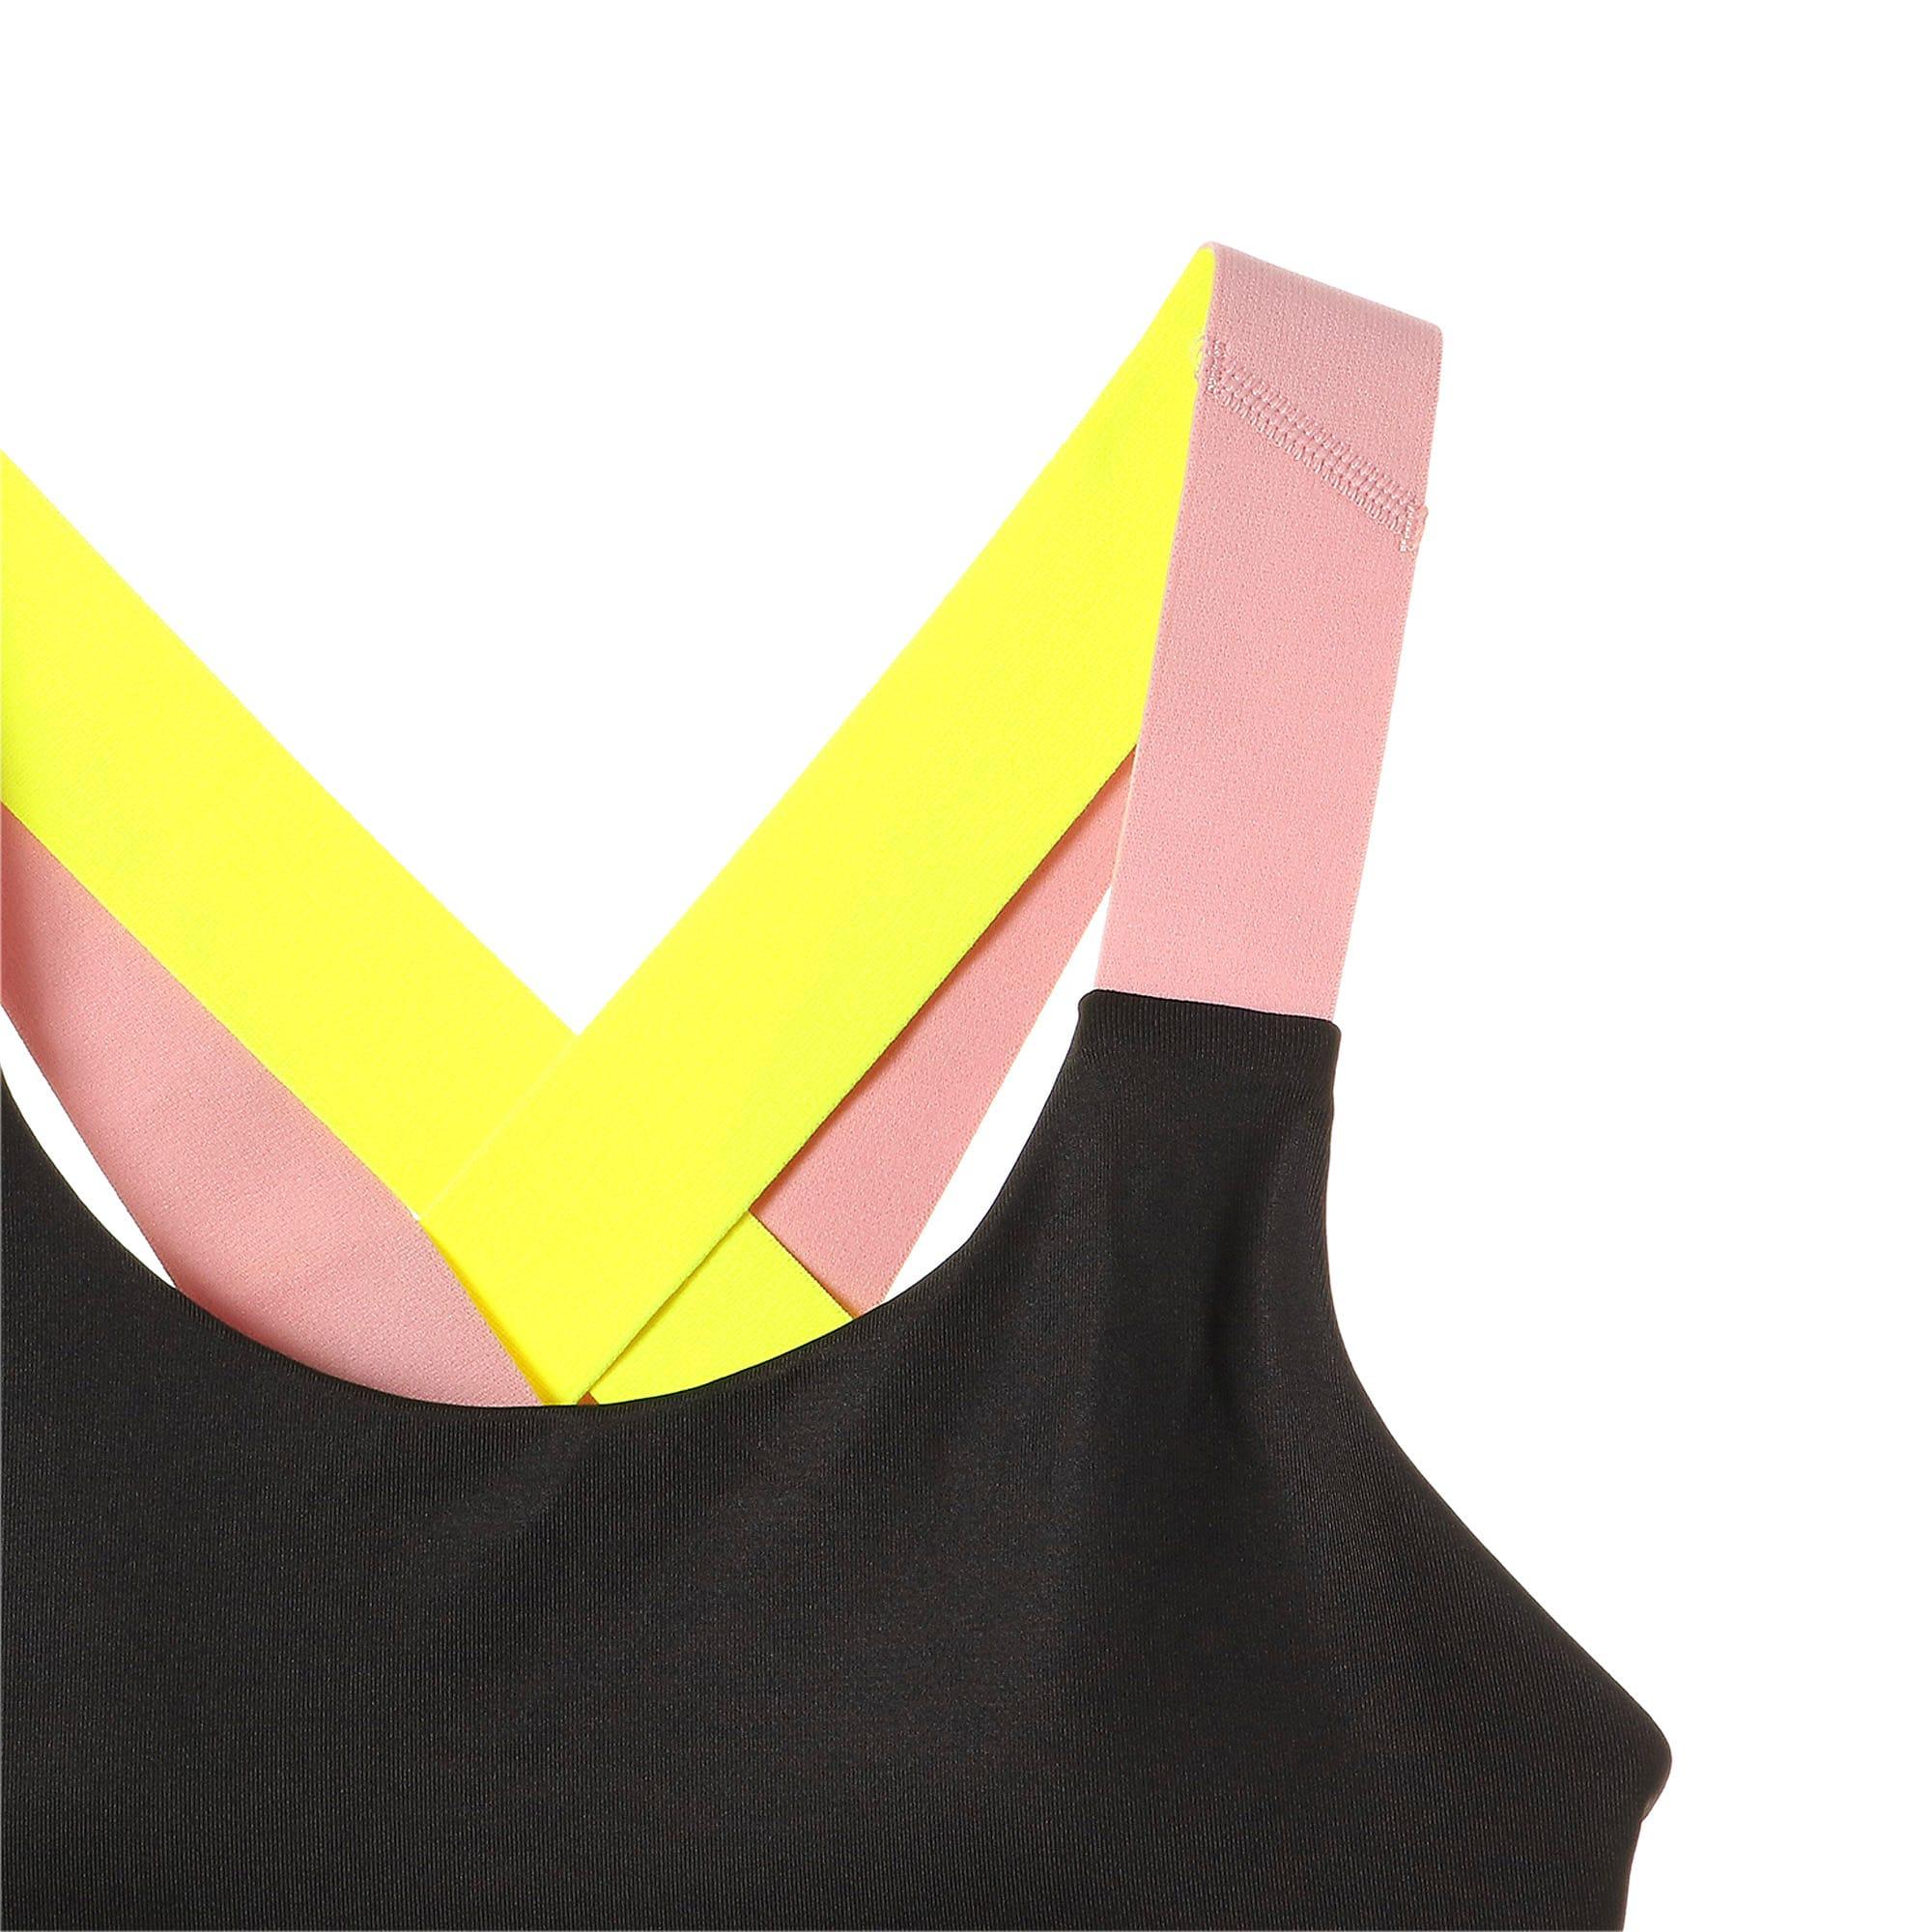 Thumbnail 8 of フィール イット ウィメンズ ブラトップ ミディアムサポート, Black-BridalRose-Yellowalert, medium-JPN